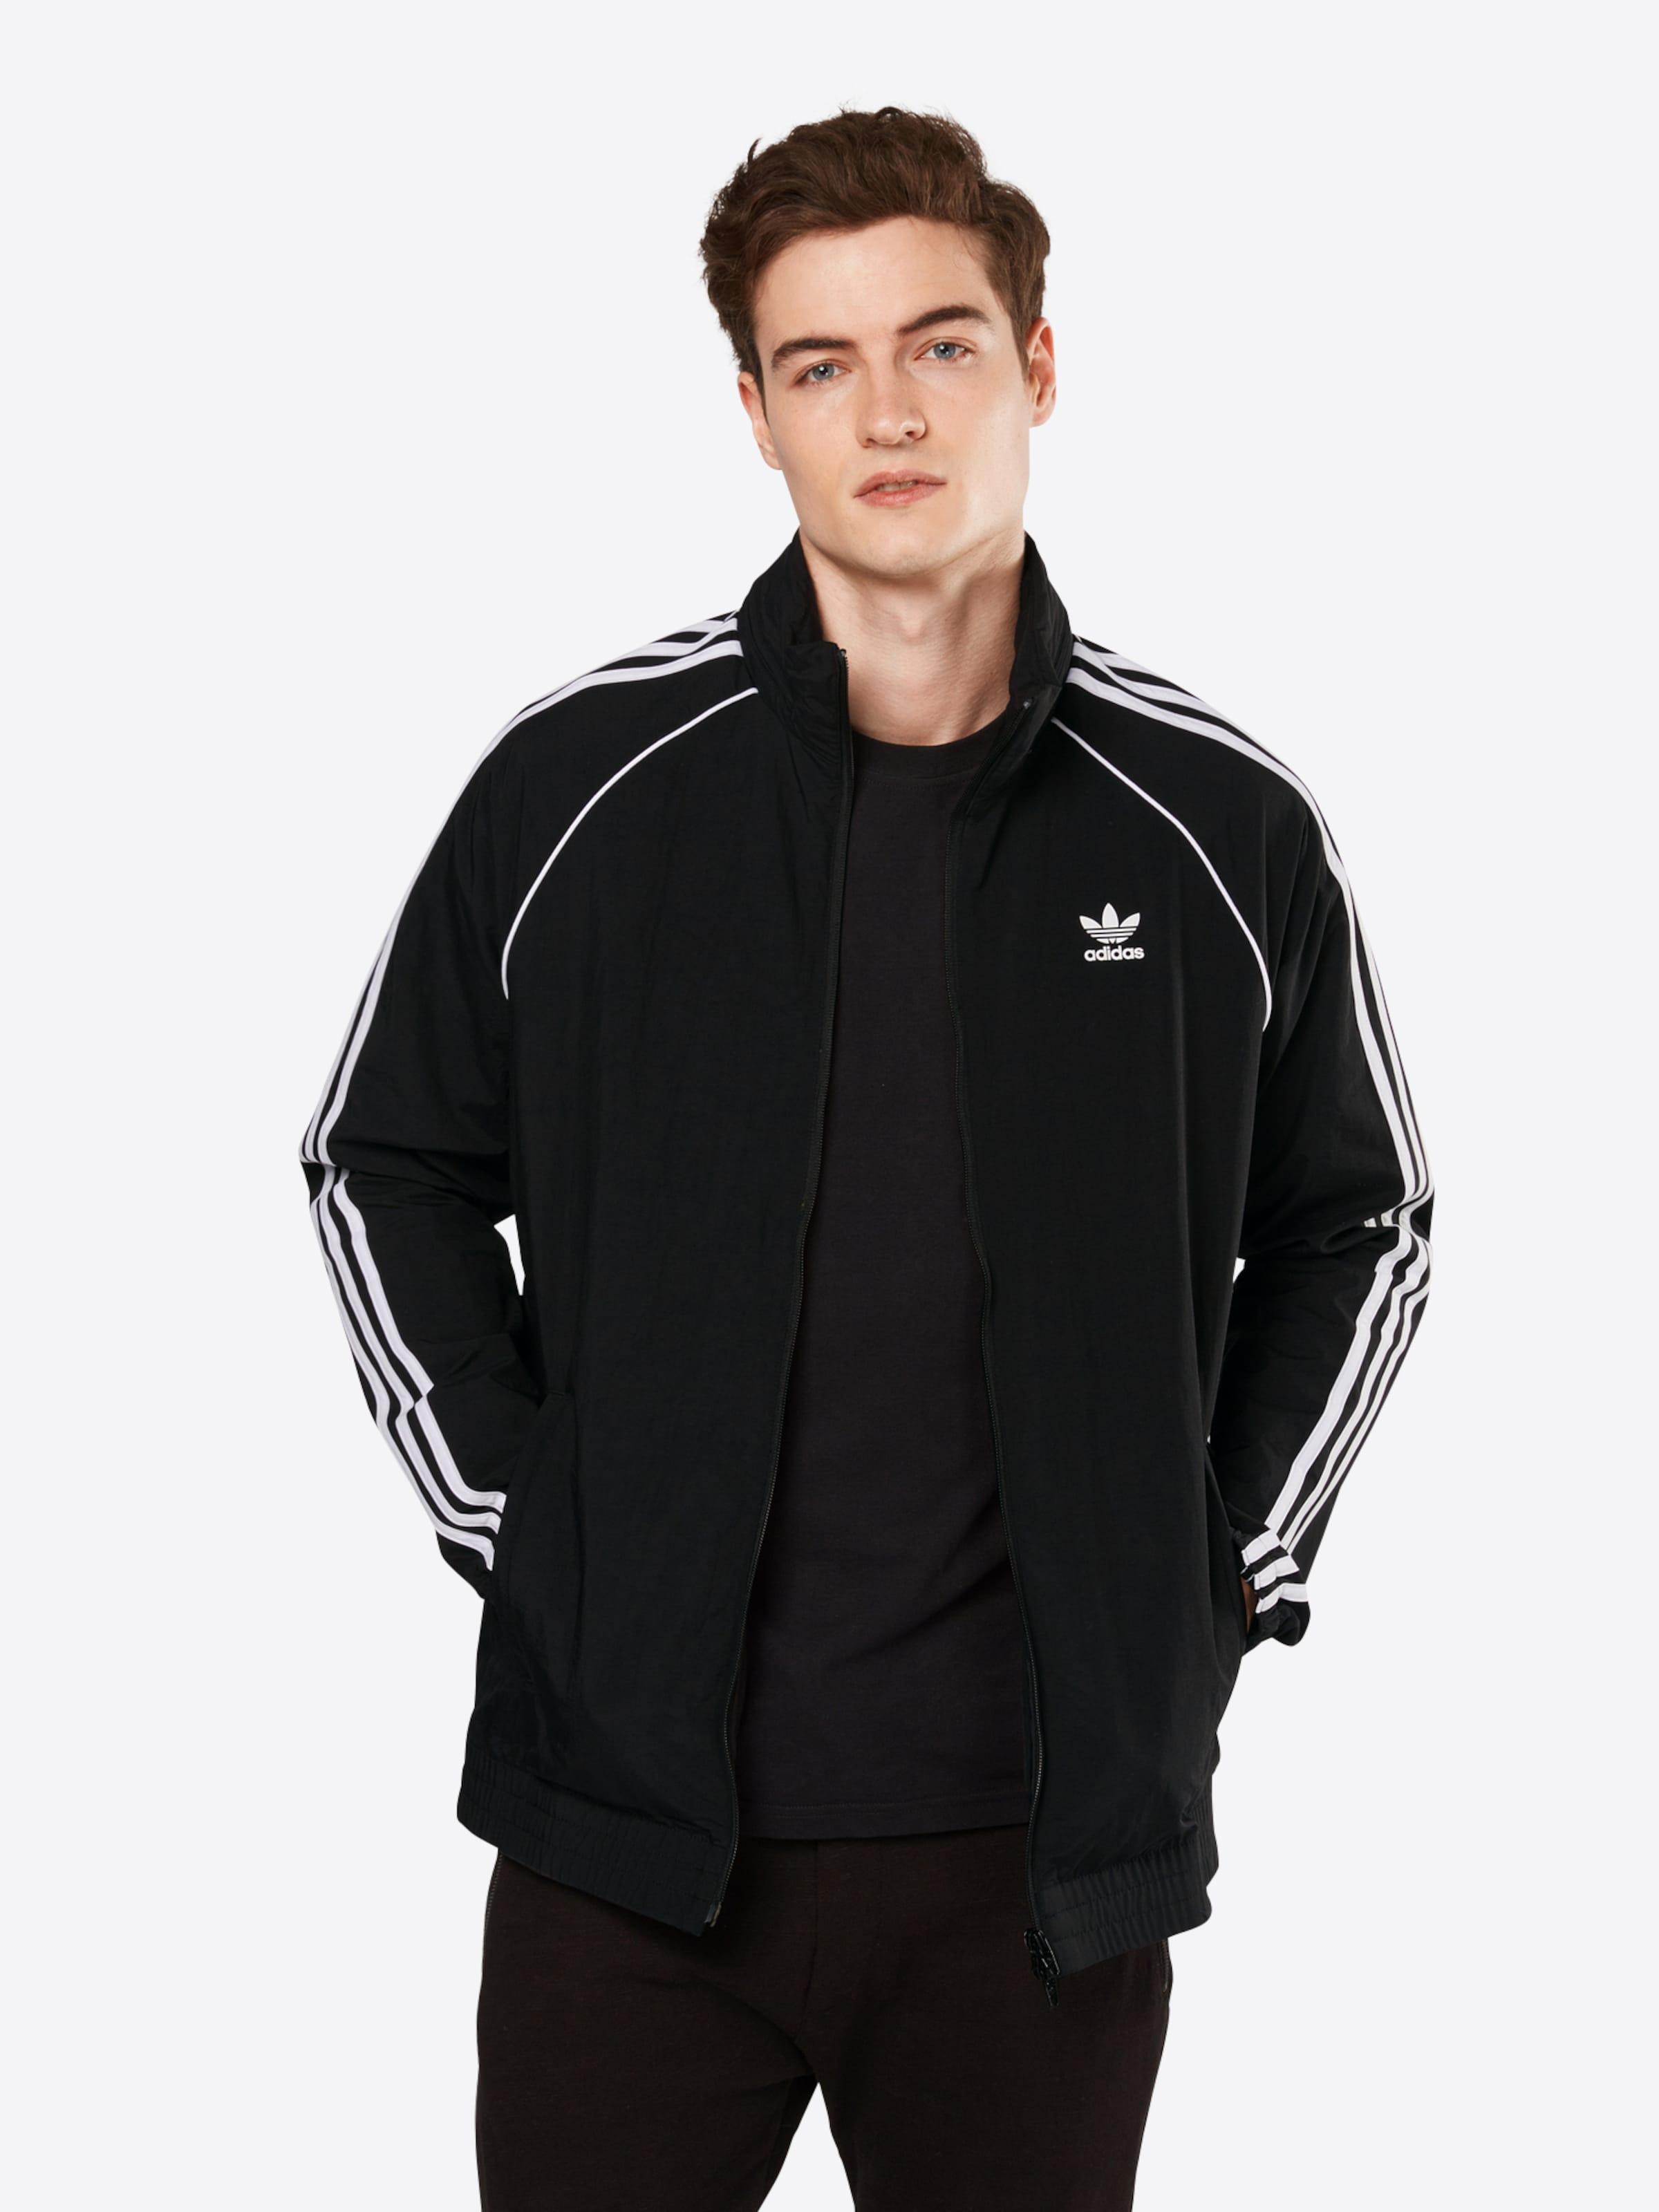 'sst Übergangsjacke Originals In Schwarz Adidas Windbreaker' I2EHYWD9